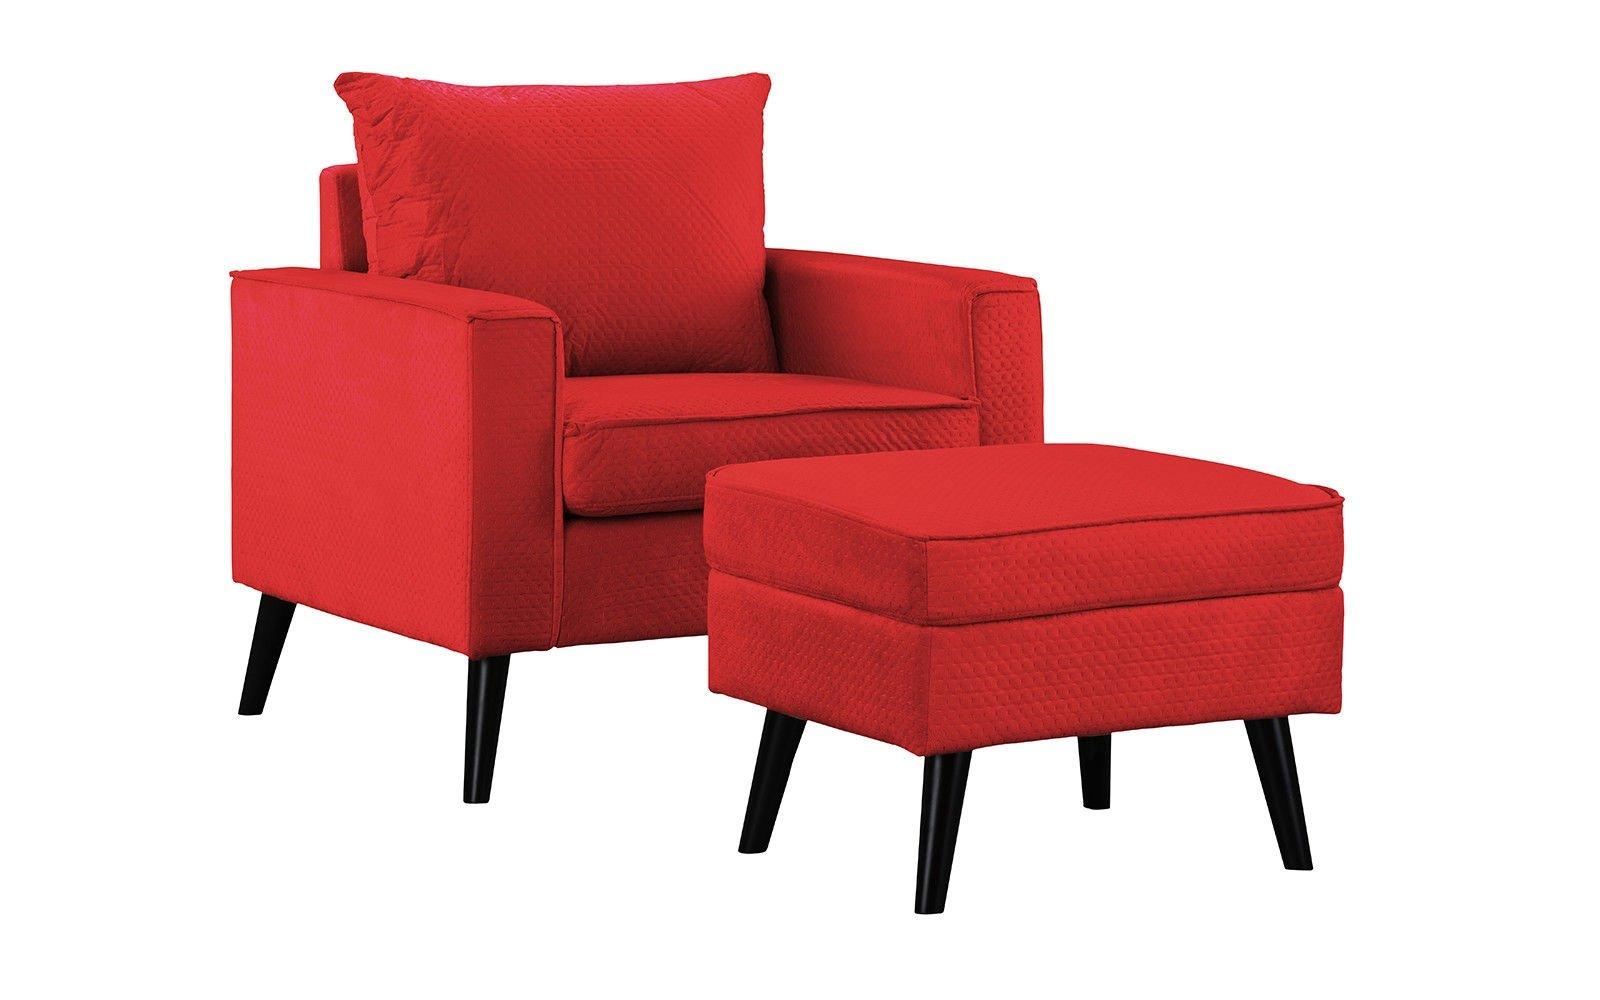 Enjoyable Details About Modern Microfiber Living Room Bedroom Accent Chair With Storage Ottoman Red Inzonedesignstudio Interior Chair Design Inzonedesignstudiocom